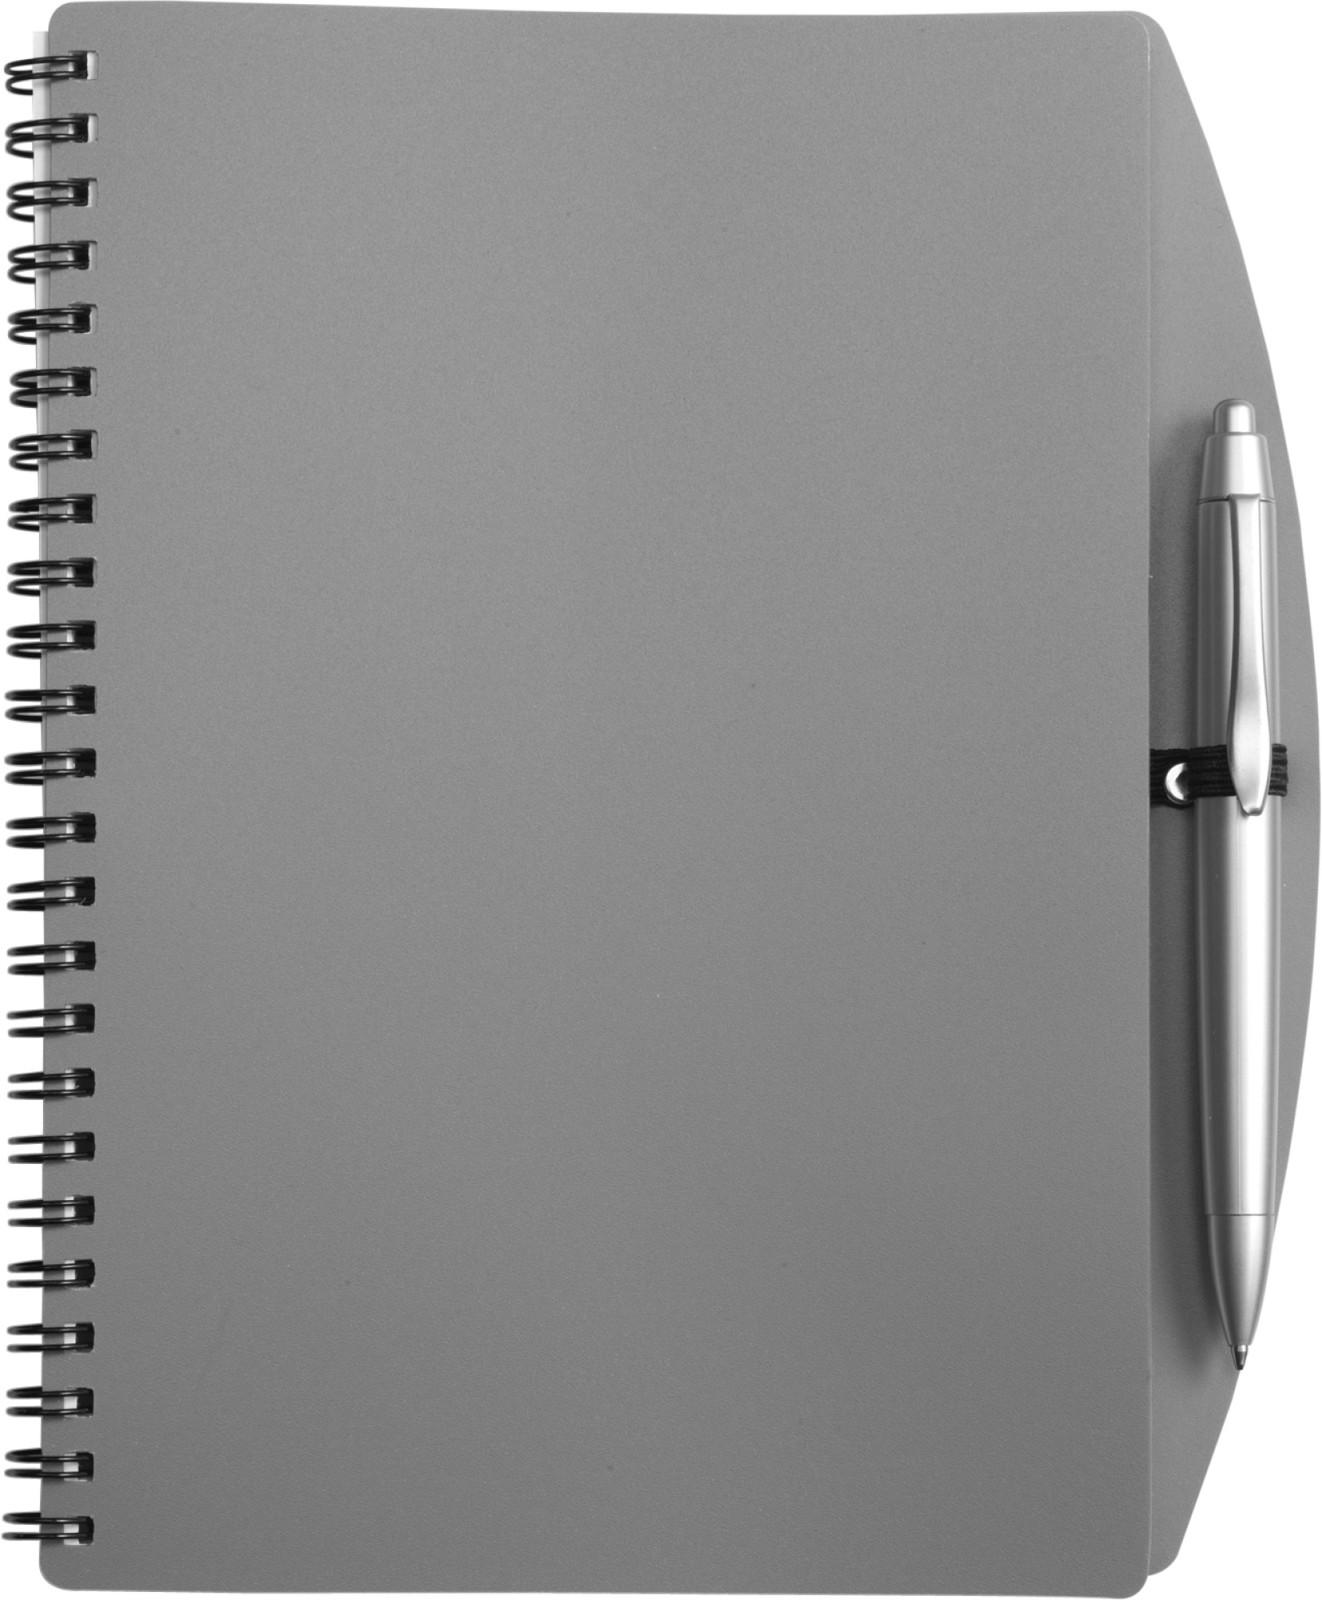 PP notebook with ballpen - Grey